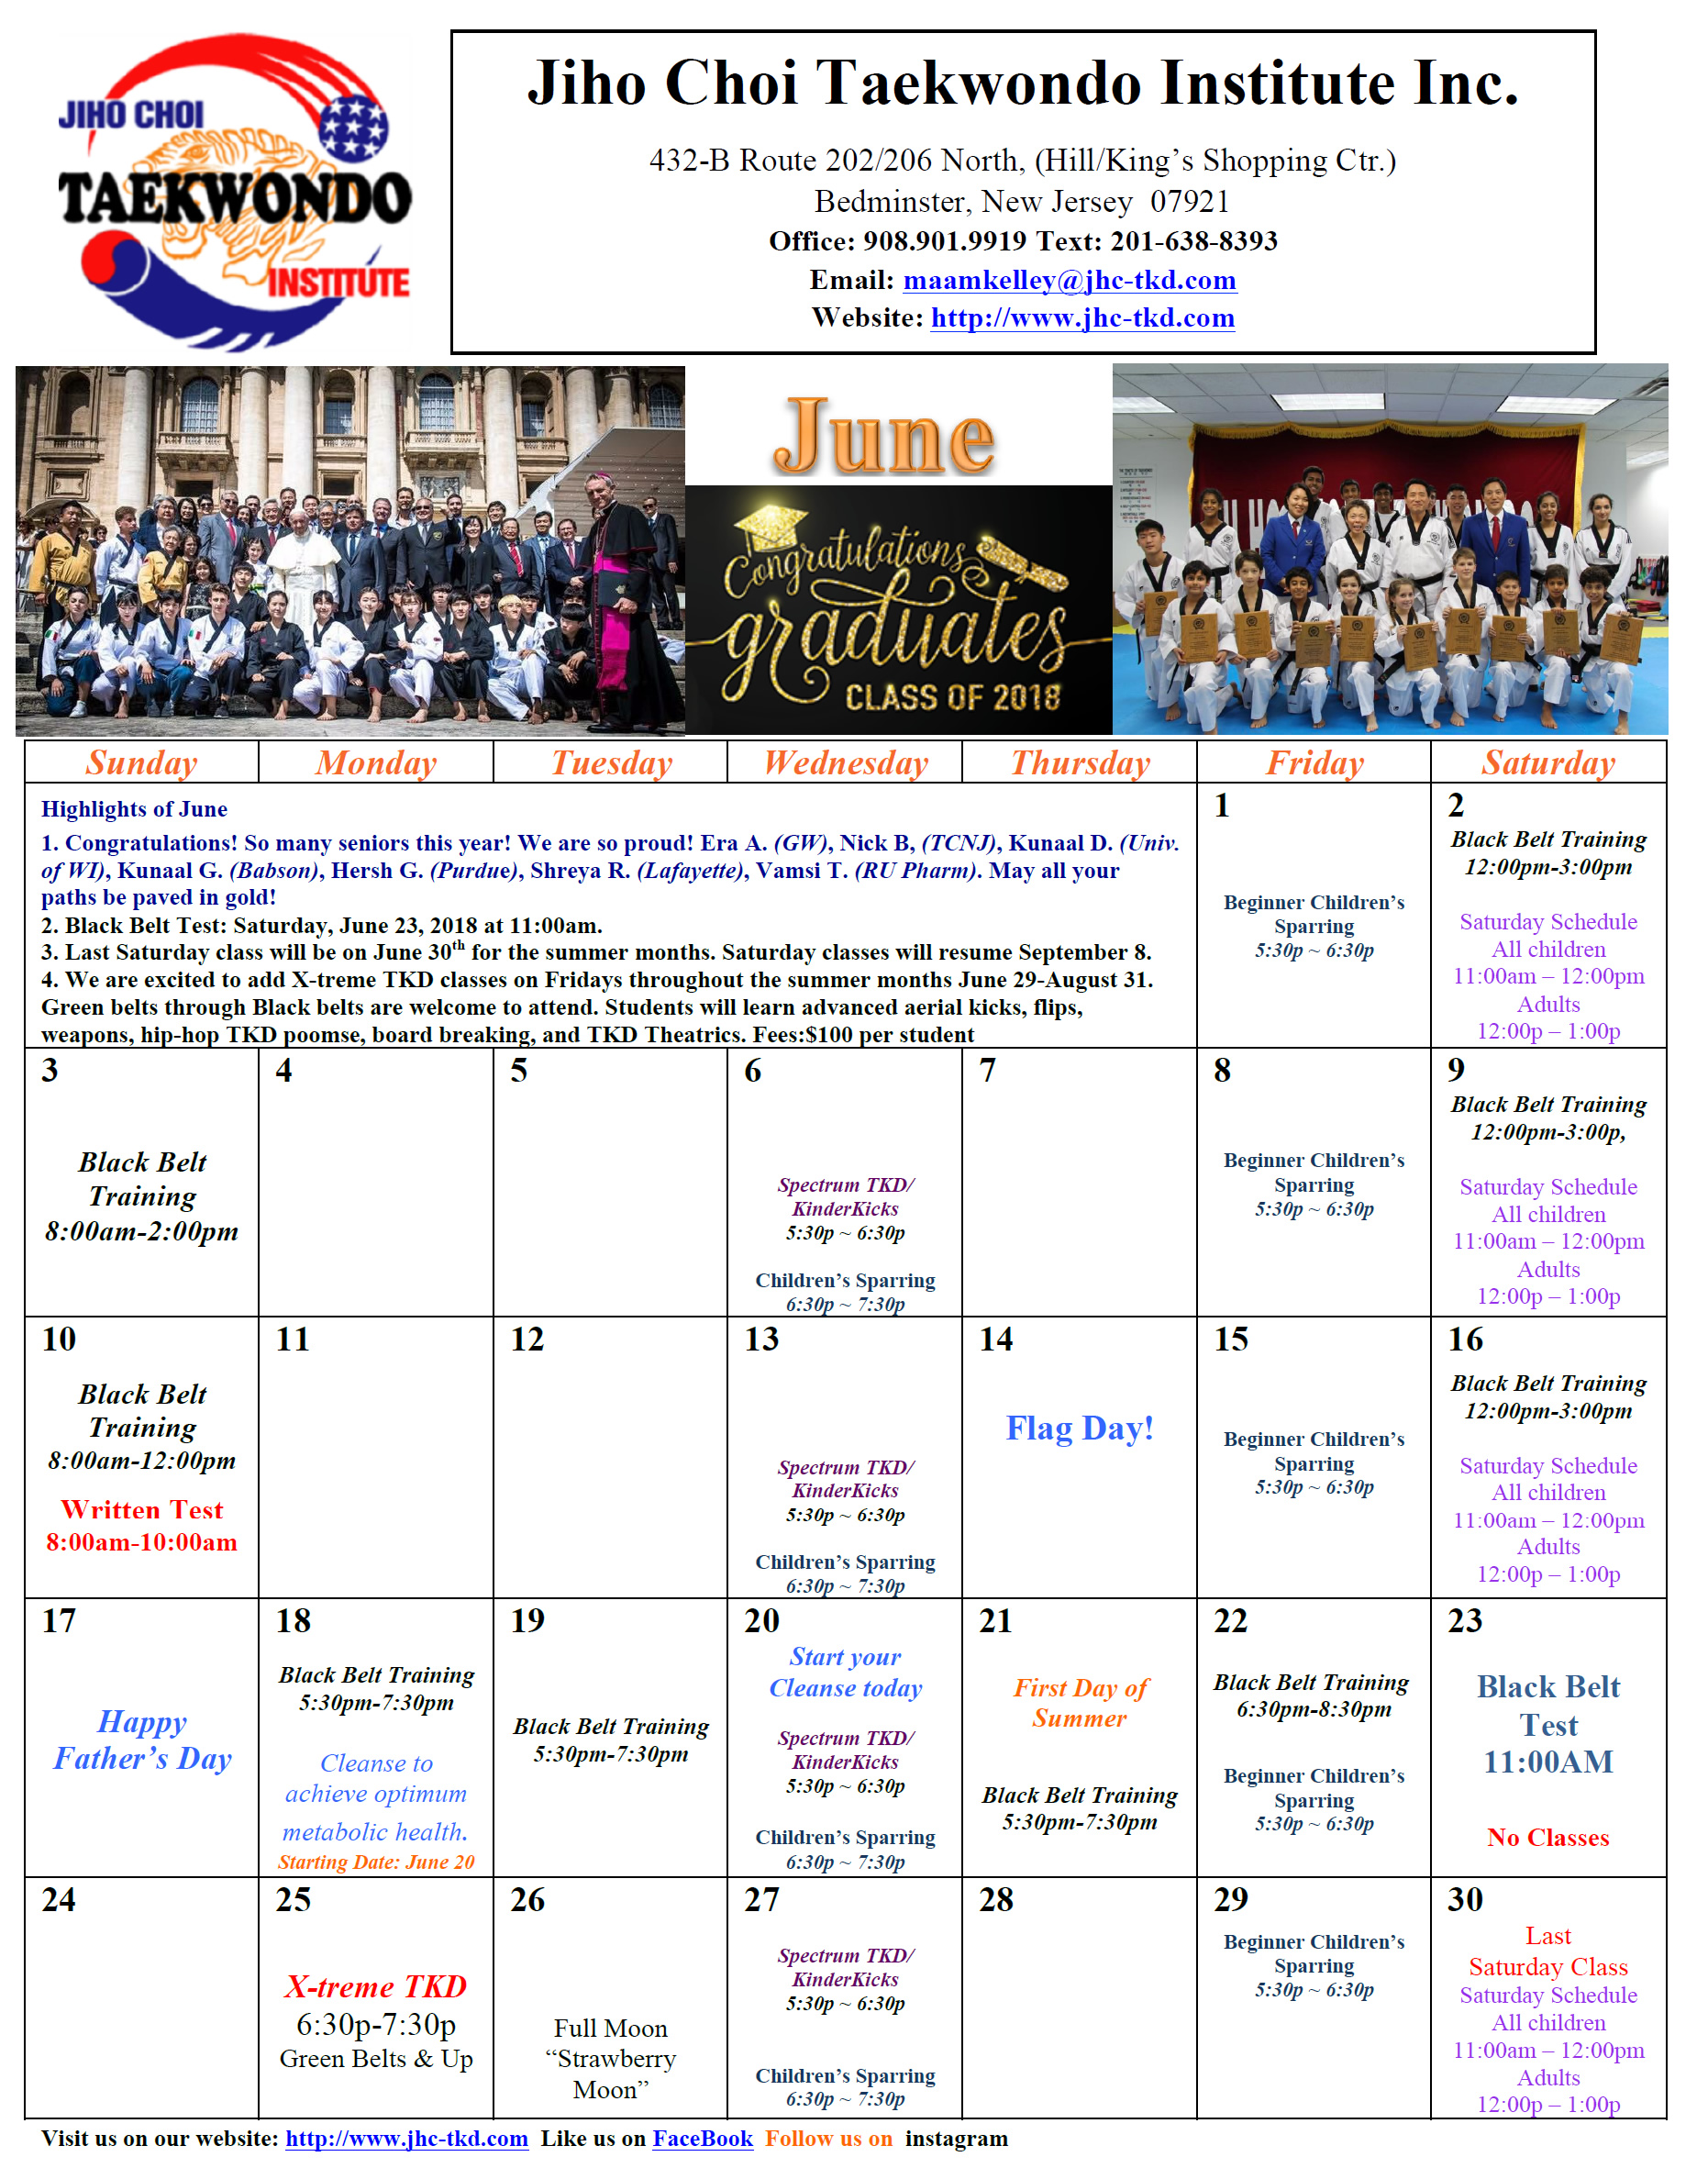 jhc-tkd-calendar-2018-06-june-fl